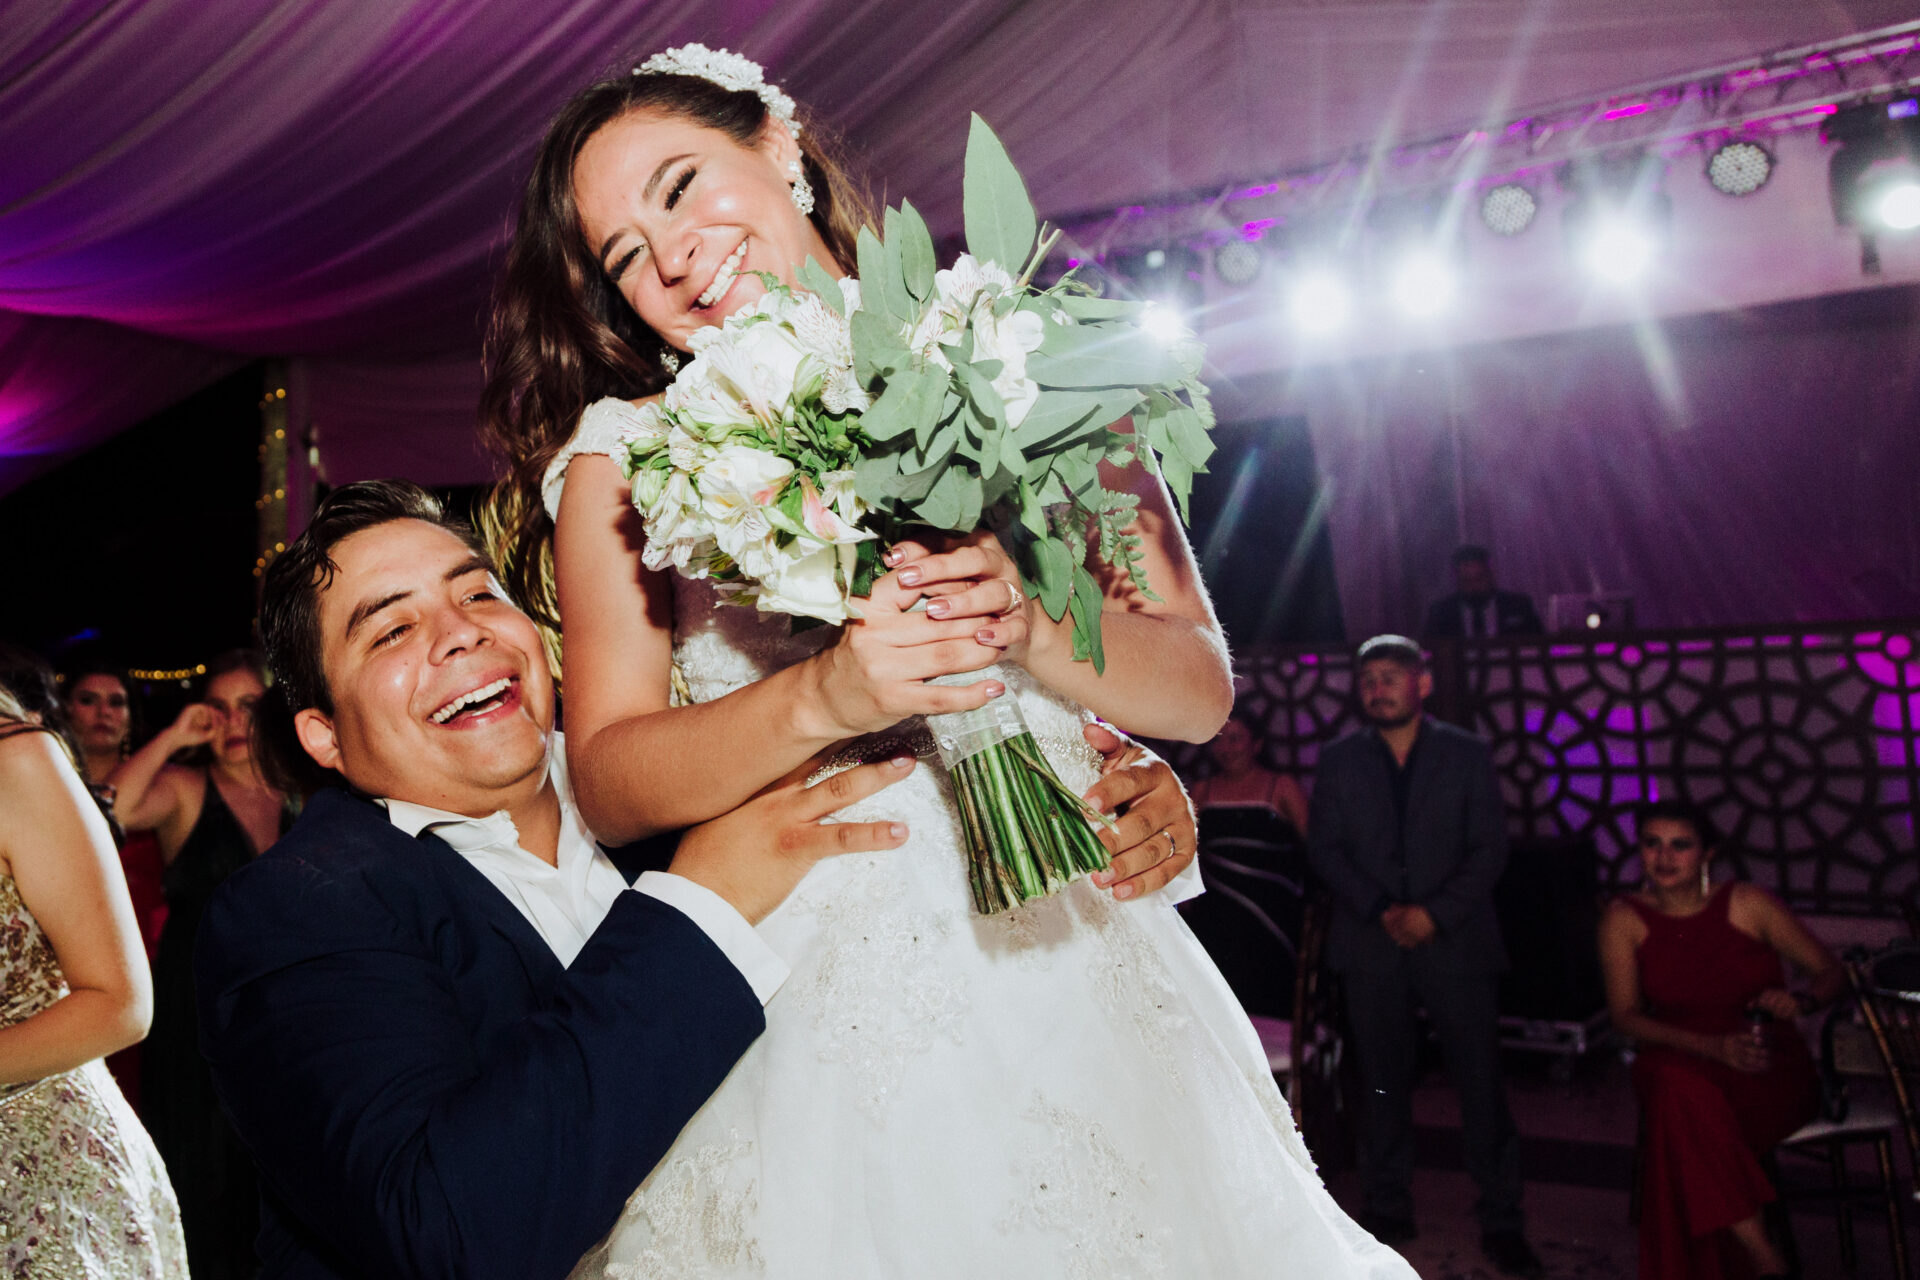 javier_noriega_fotografo_bodas_torreon_coahuila_zacatecas_wedding_photographer65a